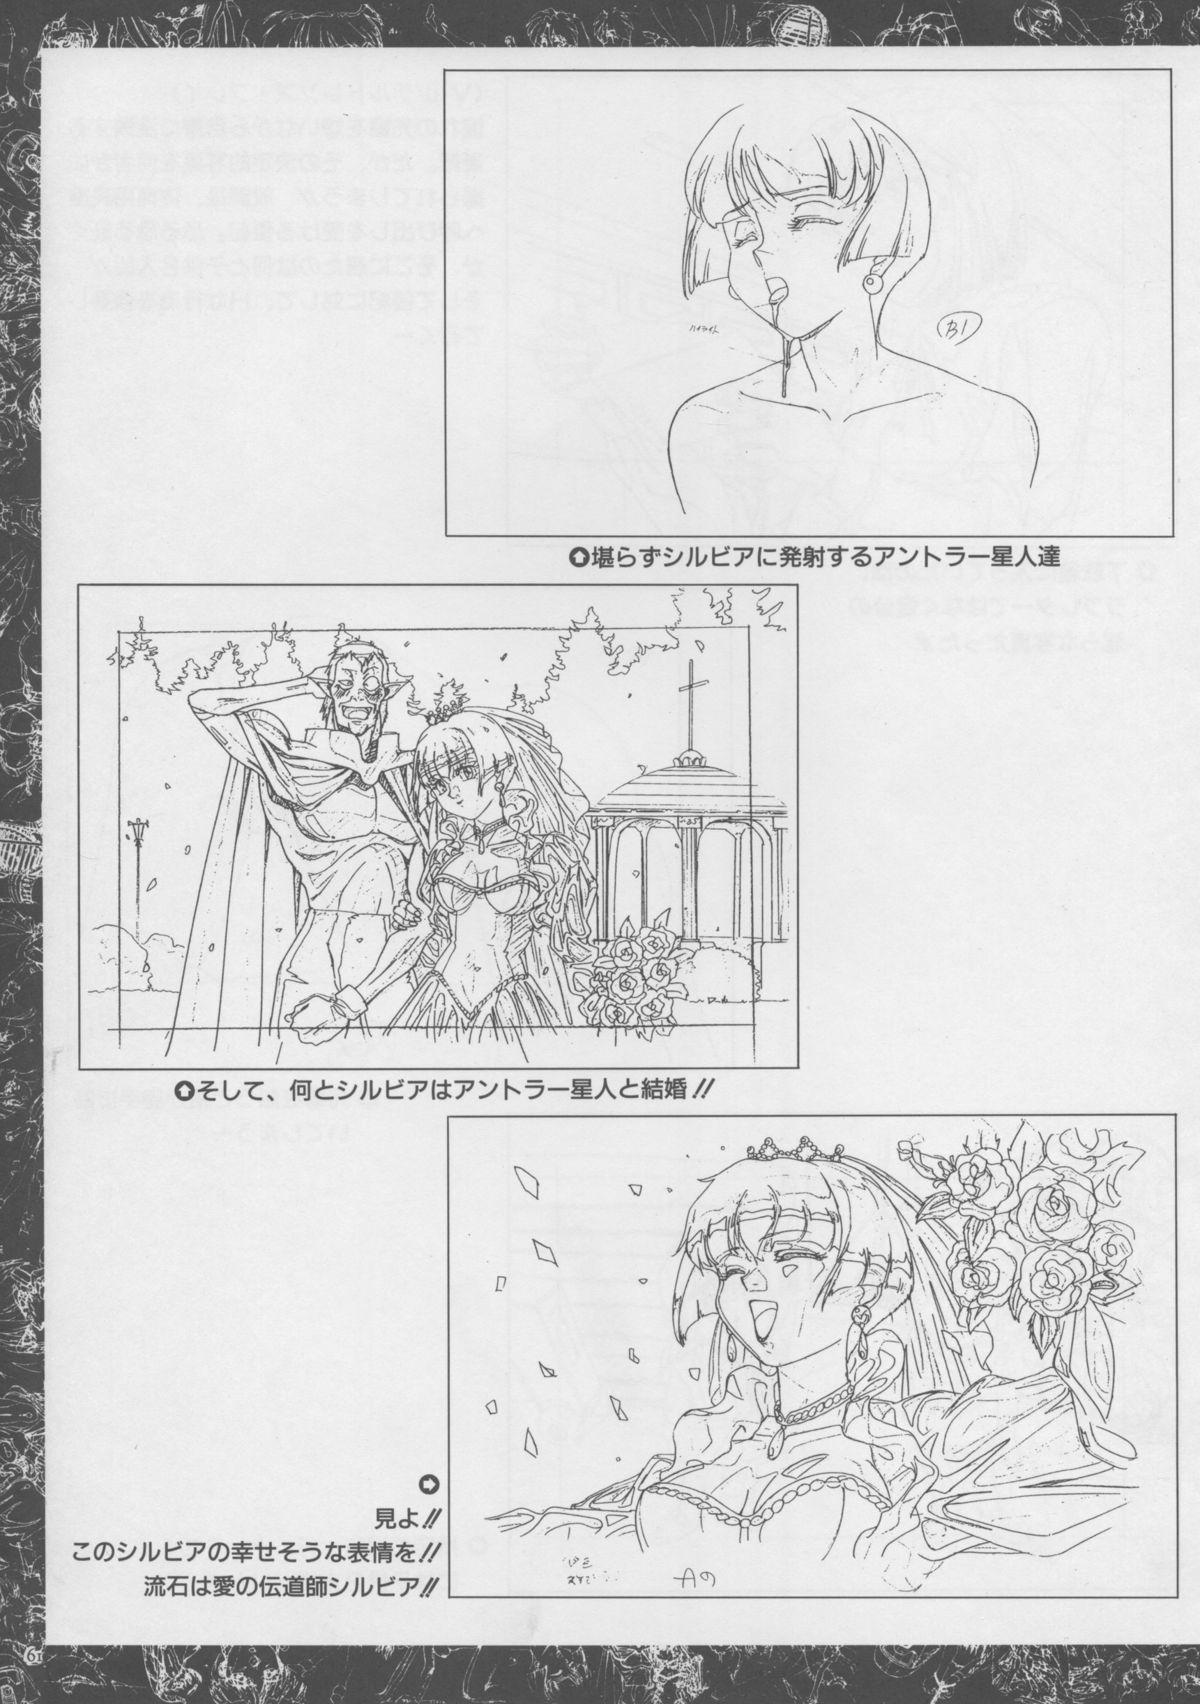 VIPER Series Official Artbook 59